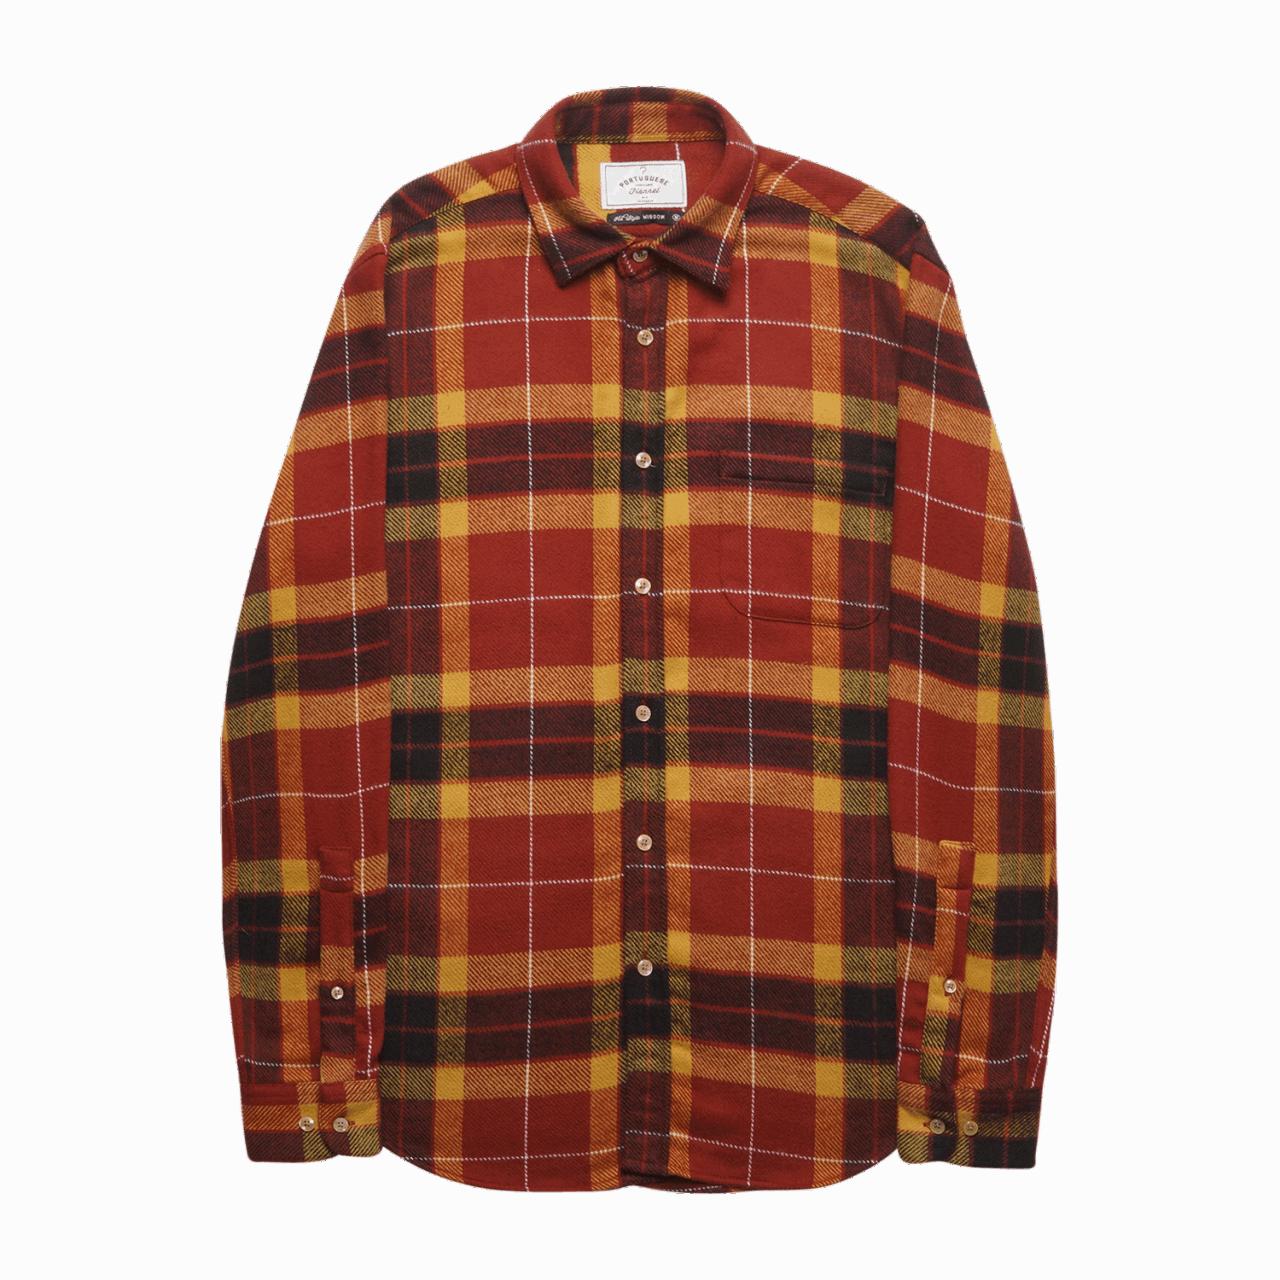 Portuguese - Baviera Check Shirt